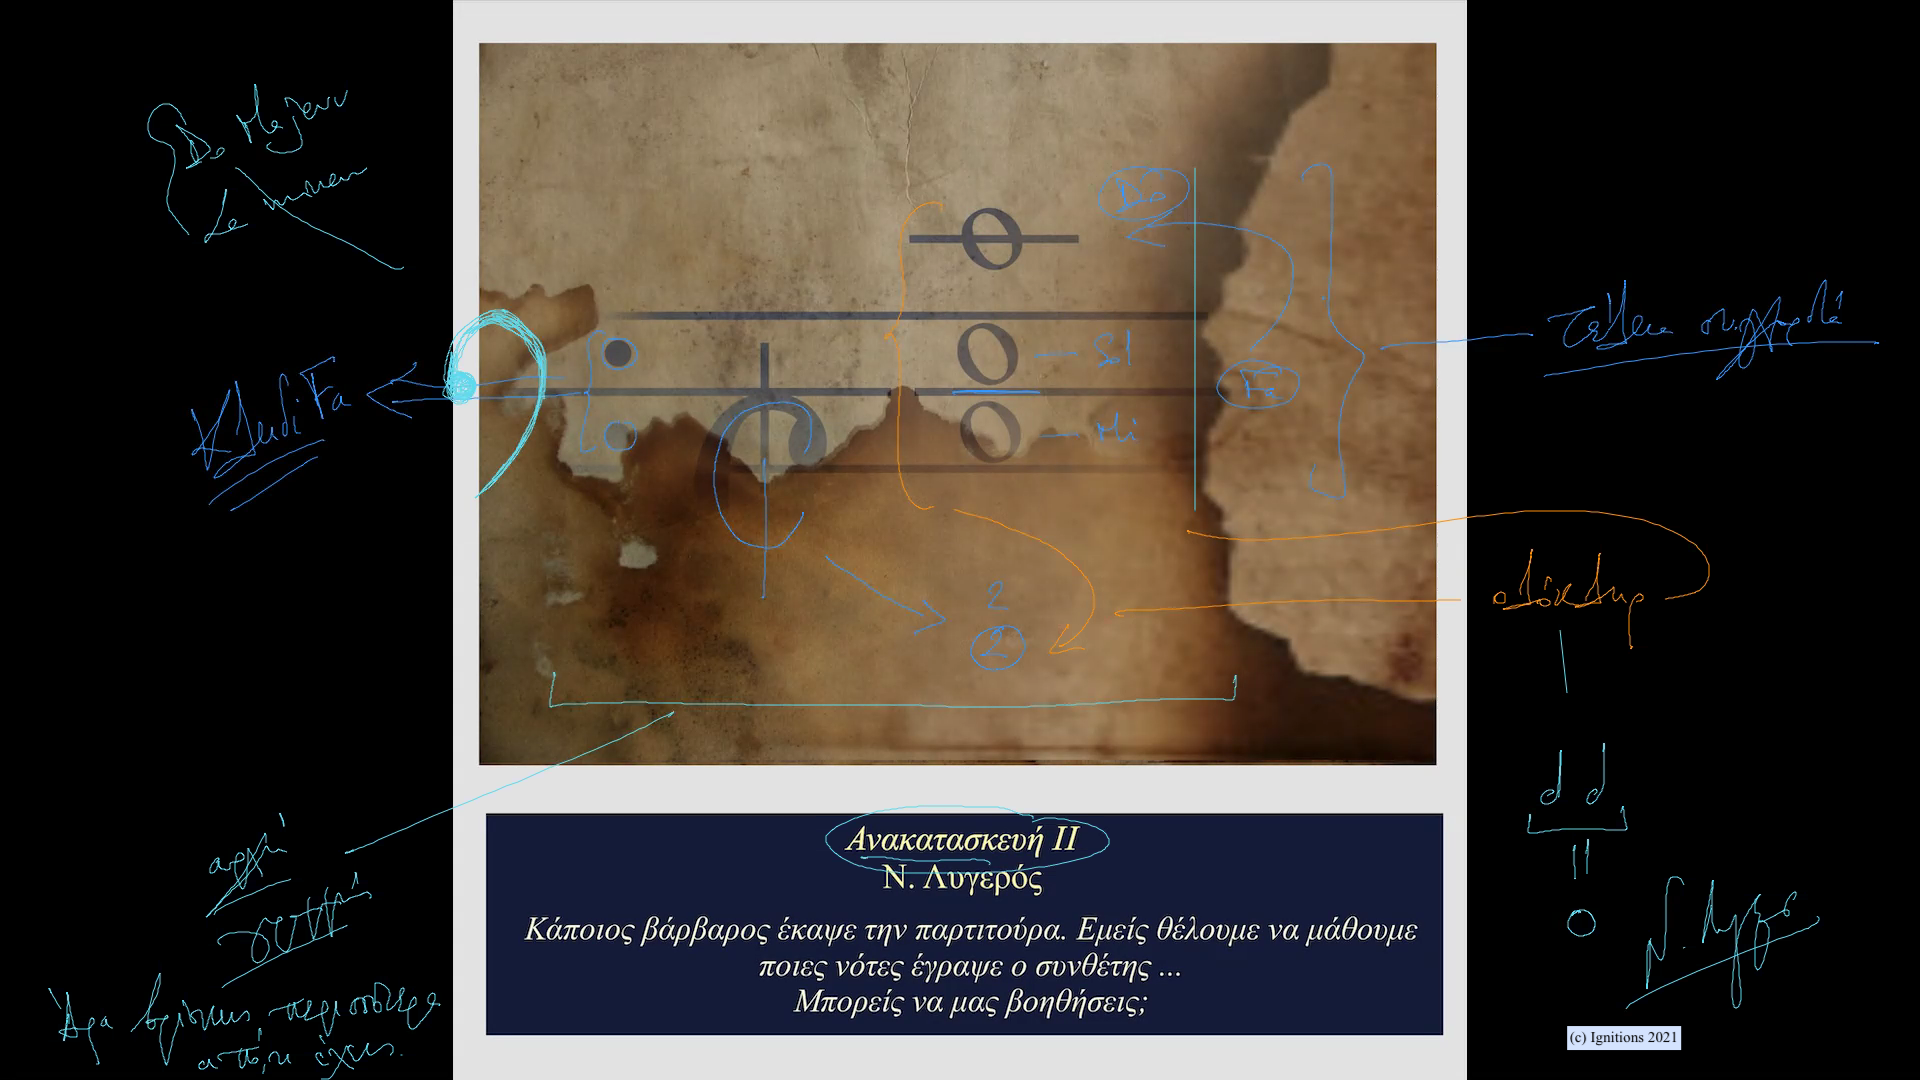 60099 - IV - e-Μάθημα: Μουσικά αινίγματα. (Dessin)